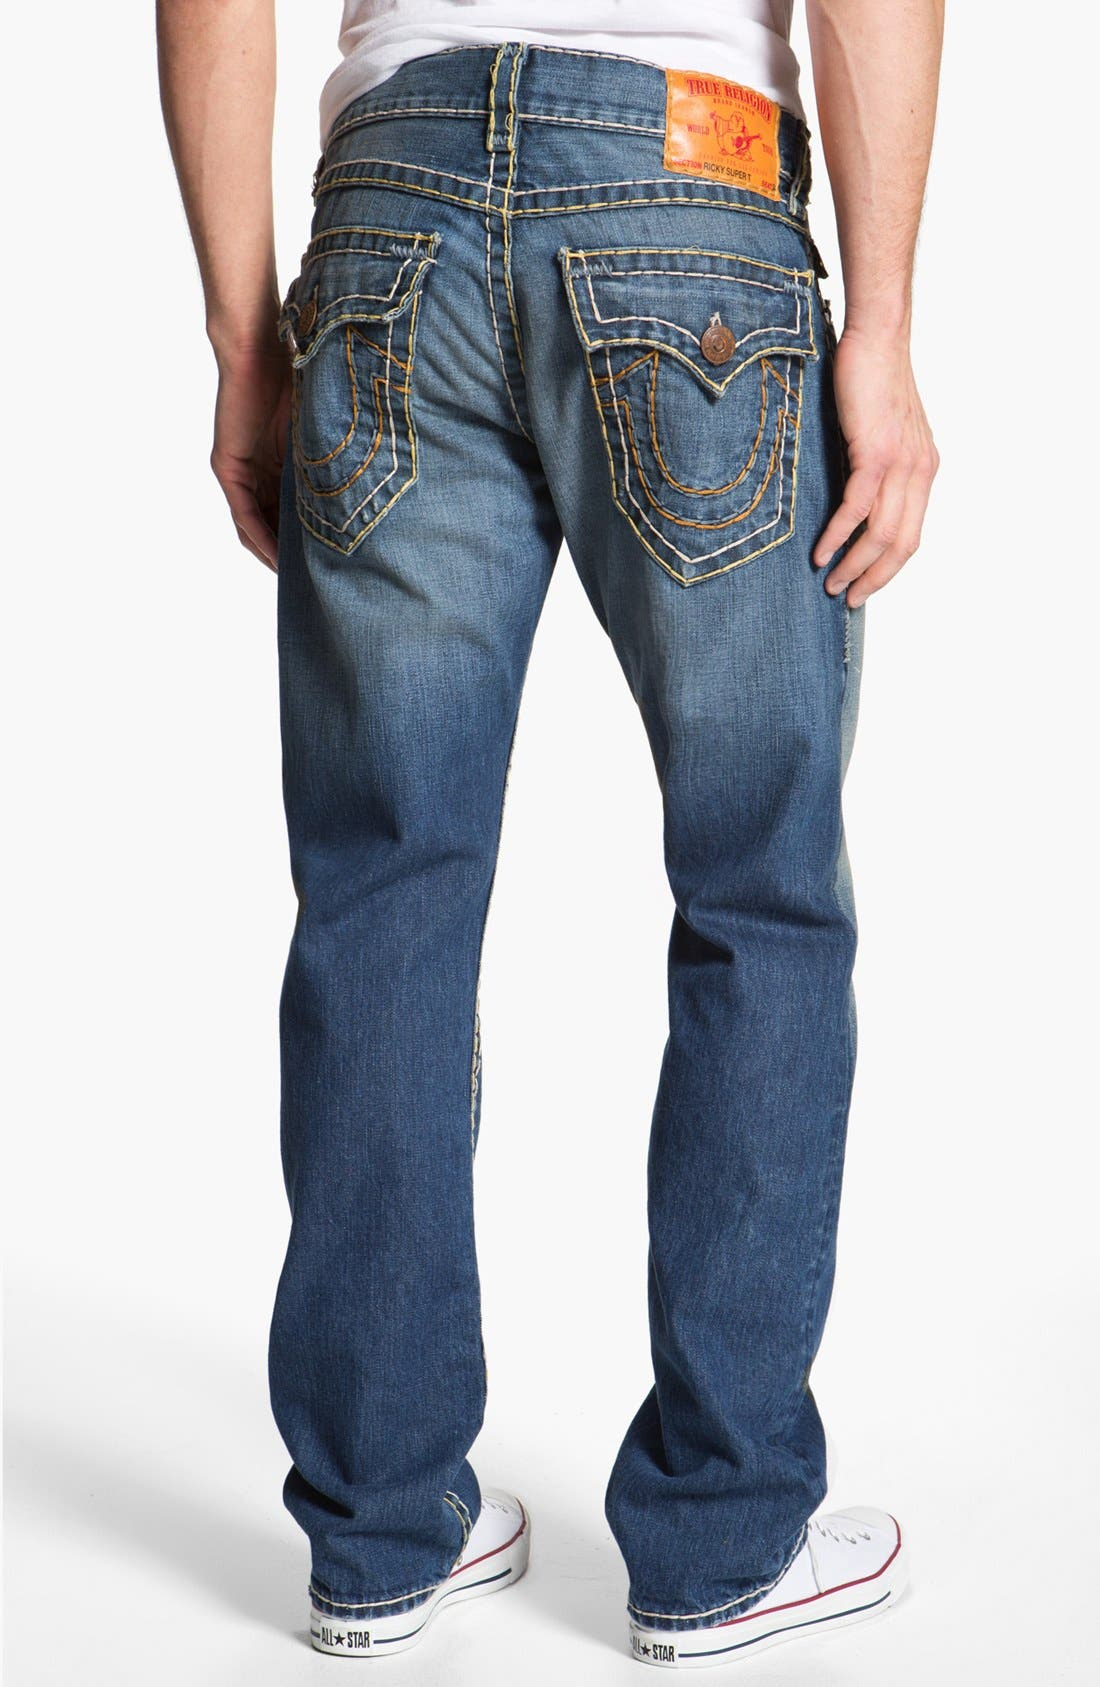 Alternate Image 1 Selected - True Religion Brand Jeans 'Ricky' Straight Leg Jeans (Tribute)